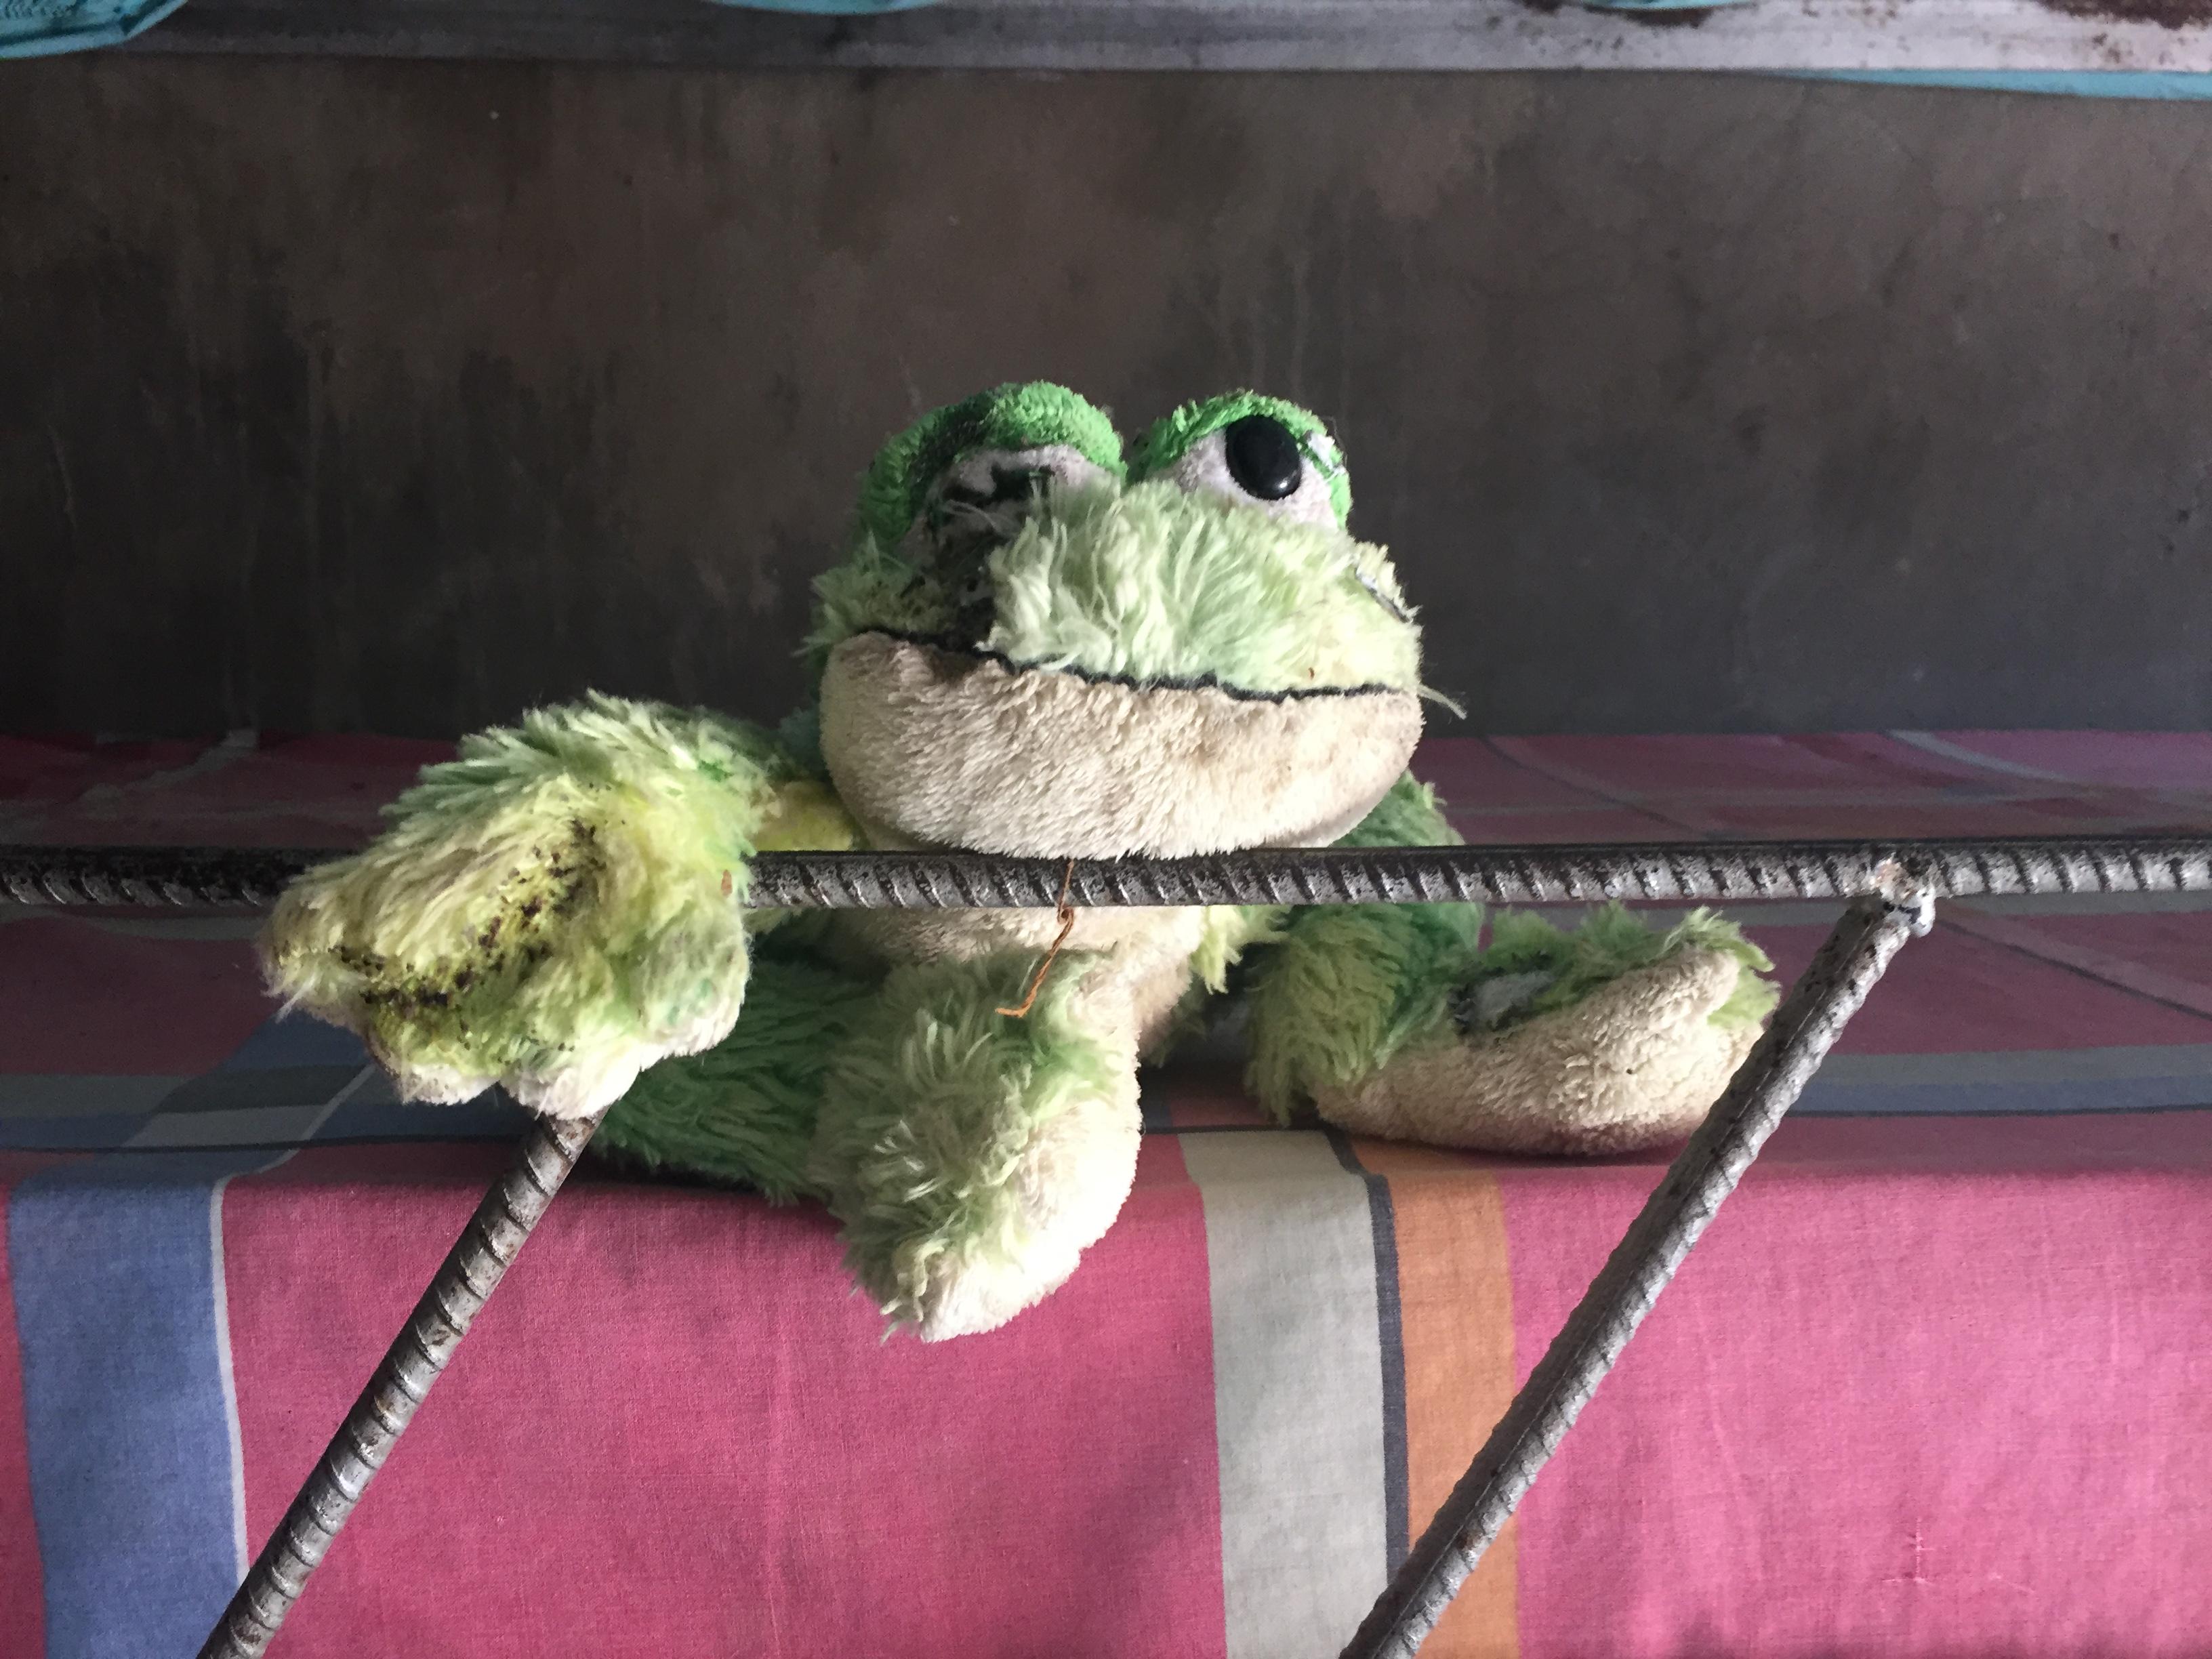 A Haitian orphan's stuffed frog